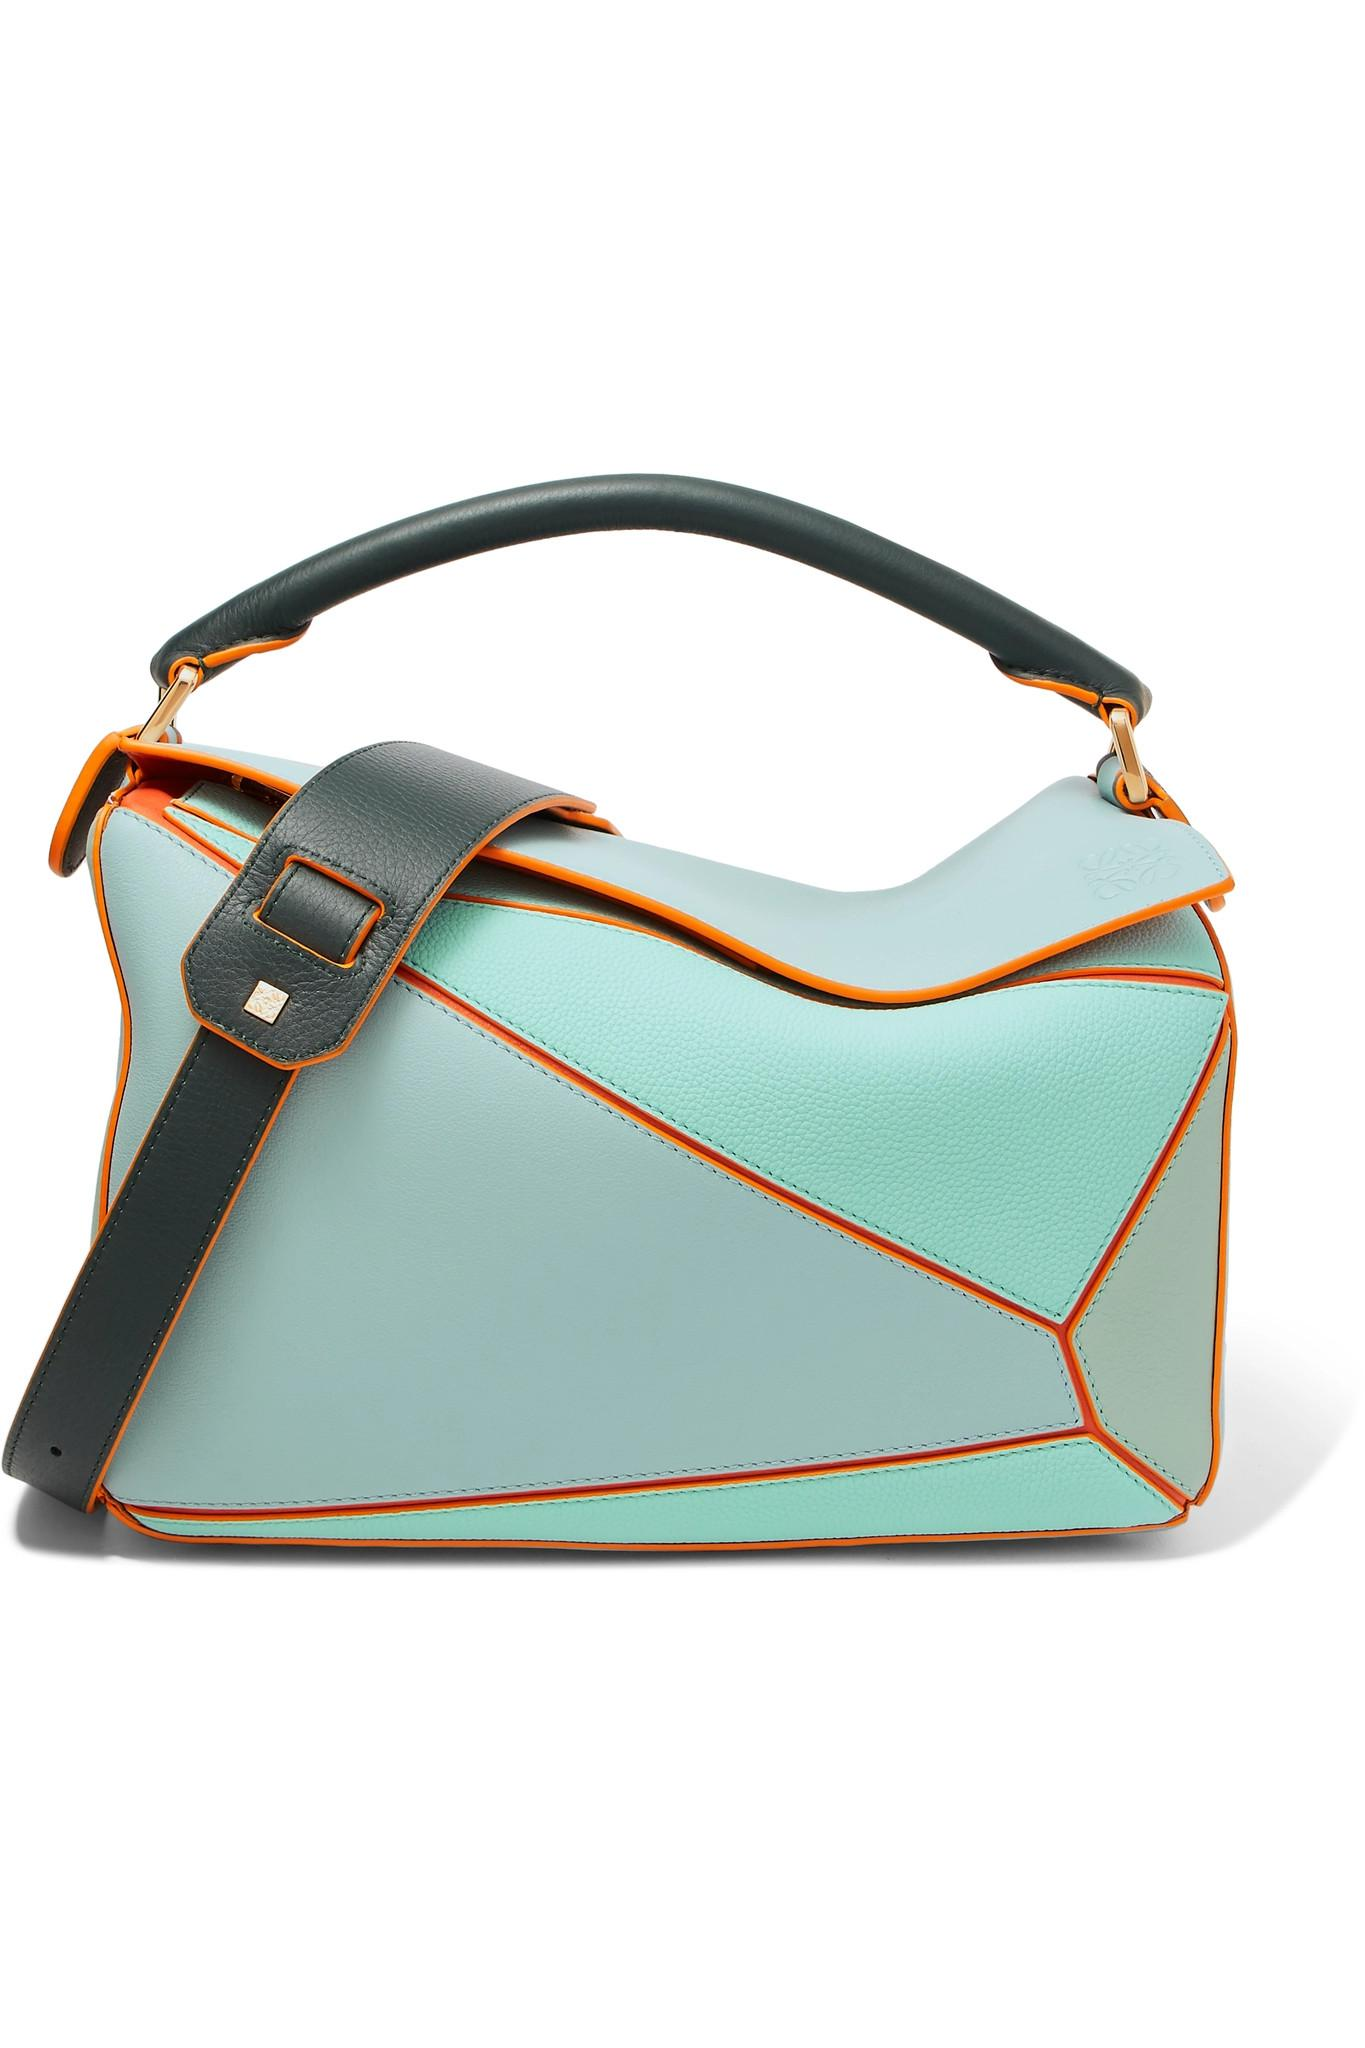 fdcc8769c80c Lyst - Loewe + Paula s Ibiza Puzzle Color-block Textured-leather ...